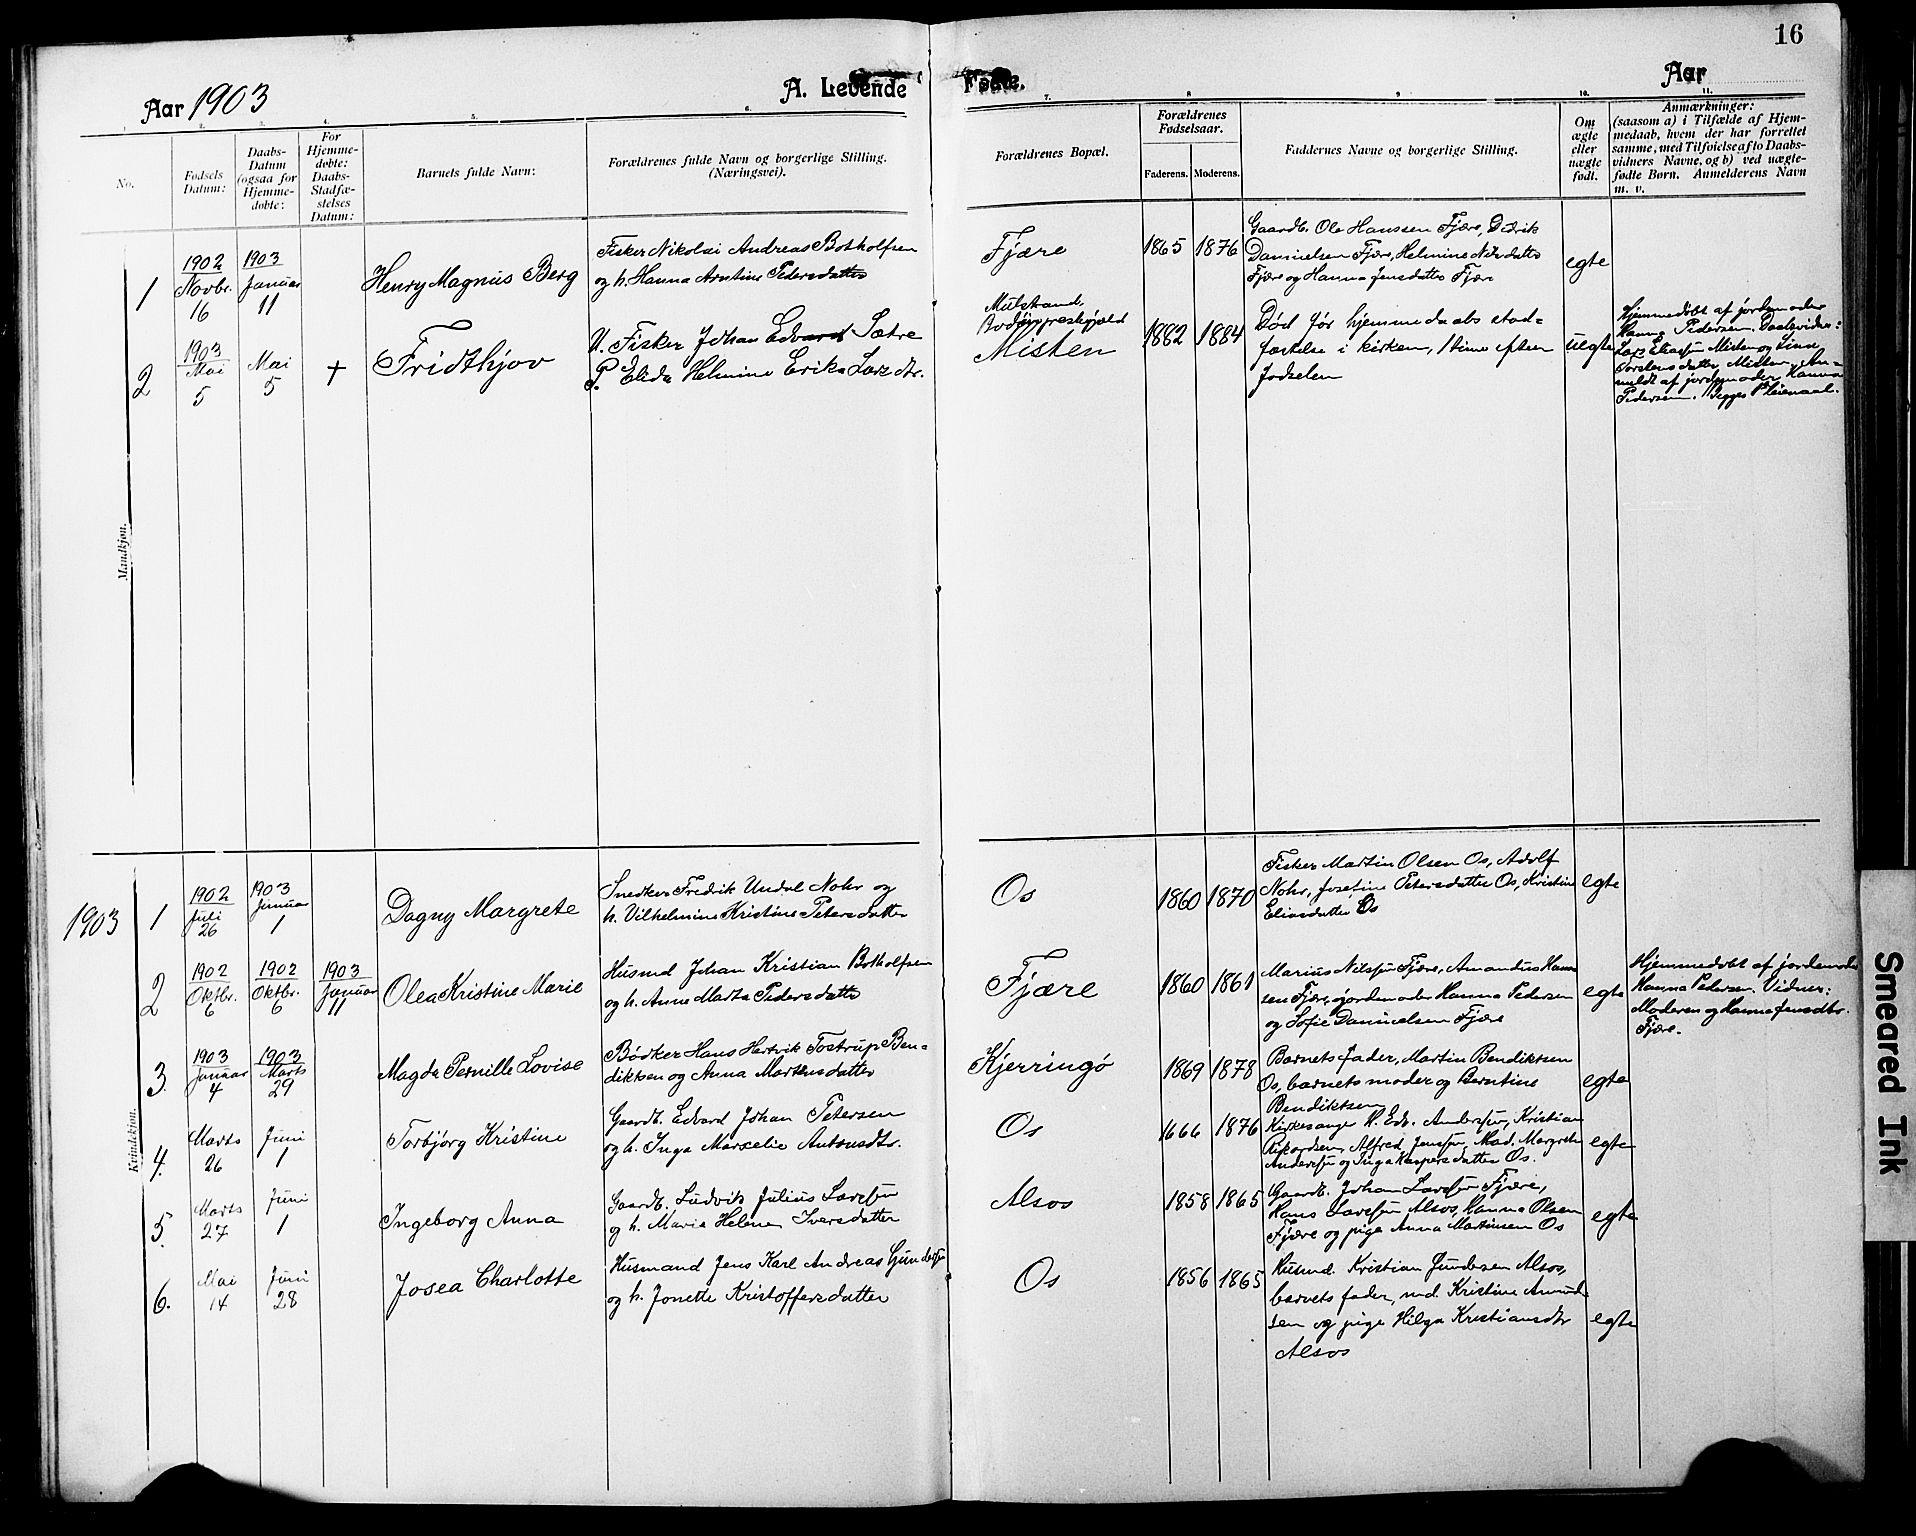 SAT, Ministerialprotokoller, klokkerbøker og fødselsregistre - Nordland, 803/L0077: Klokkerbok nr. 803C04, 1897-1930, s. 16